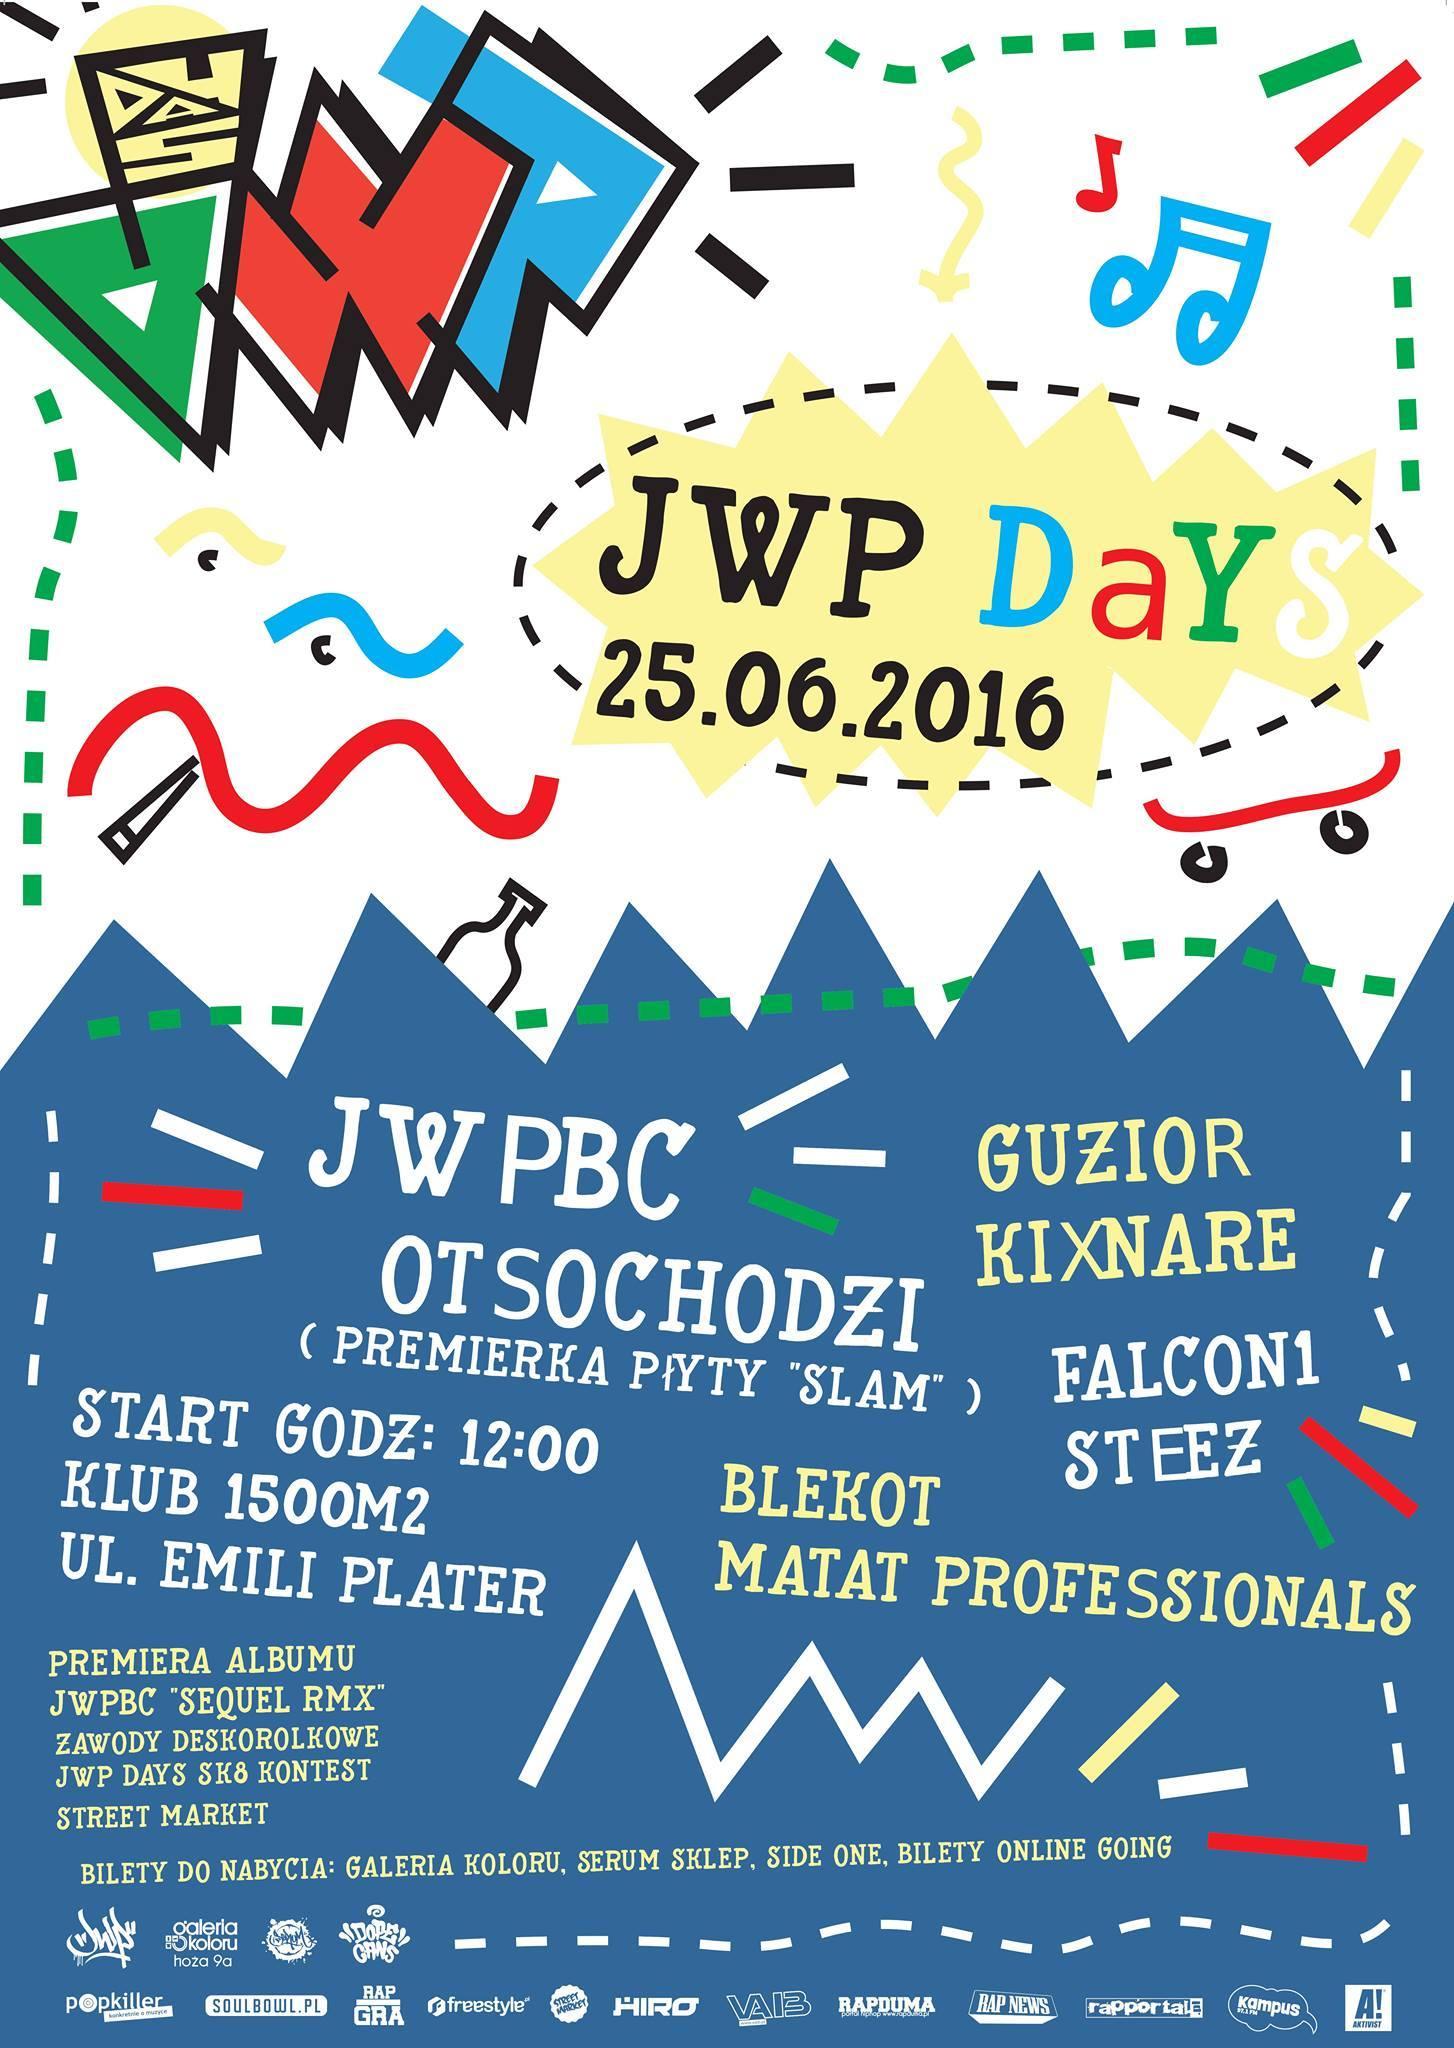 JWP DAYS 2016